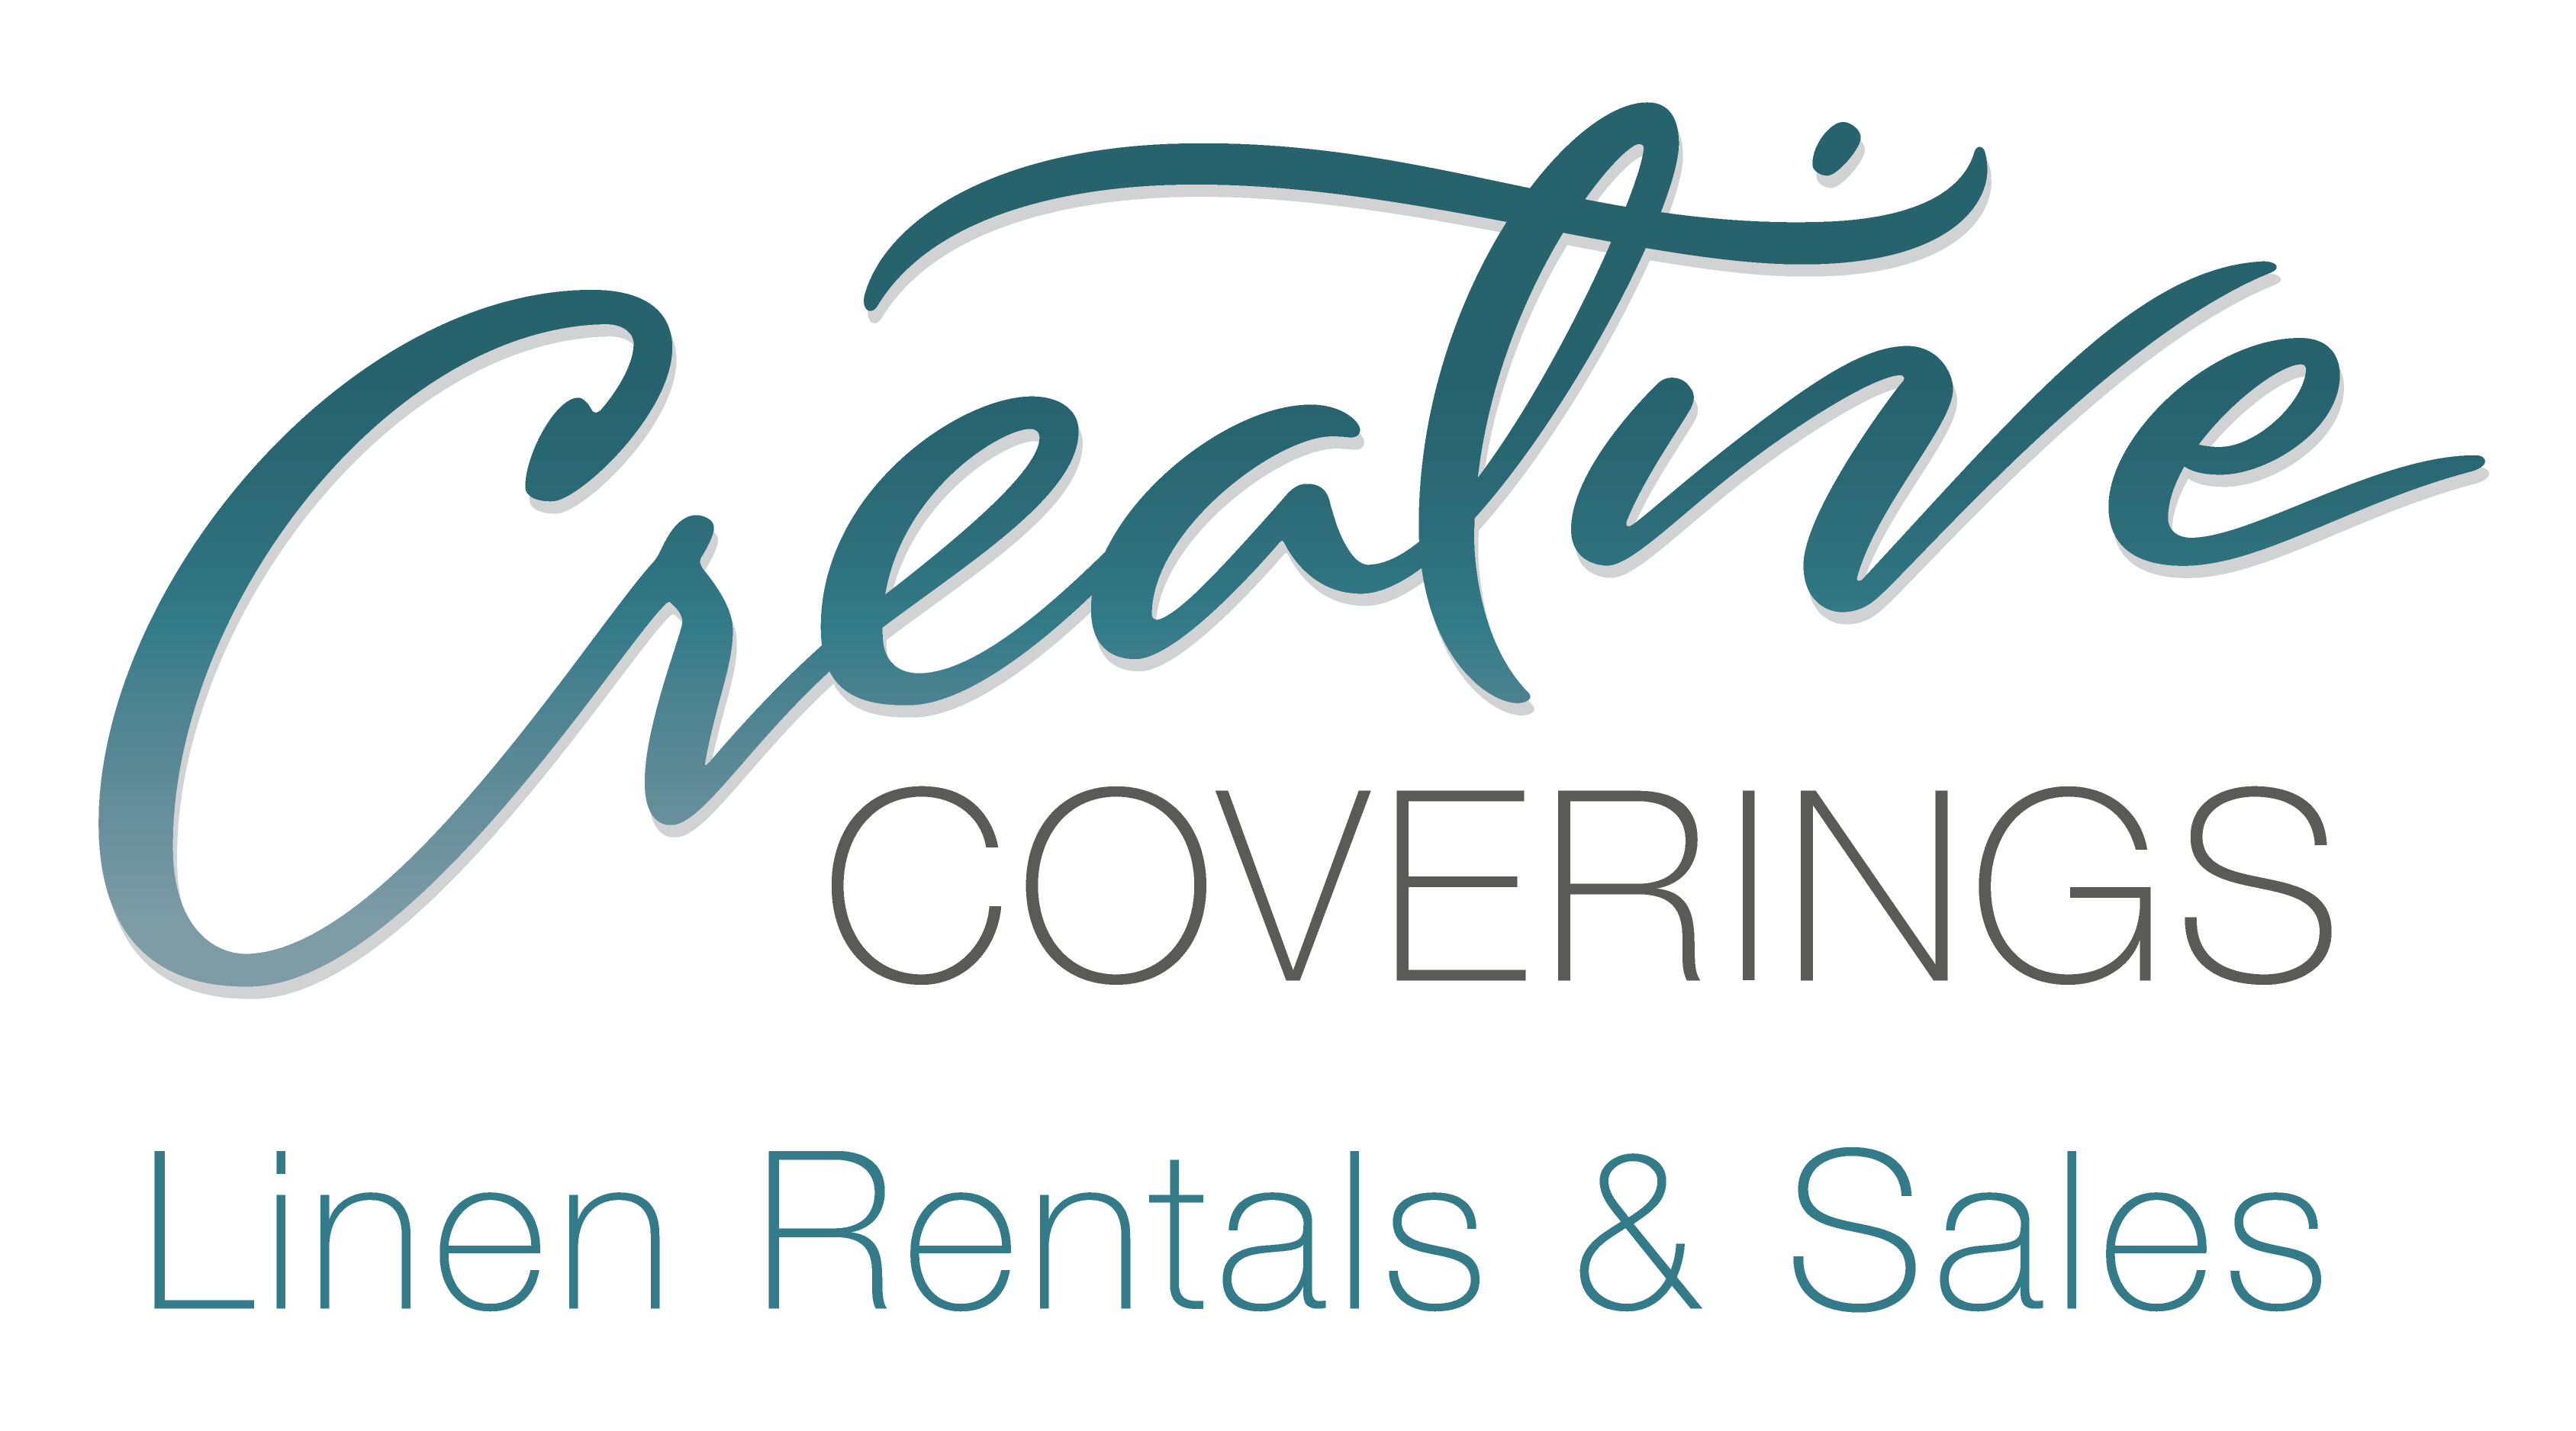 Creative Coverings Logo